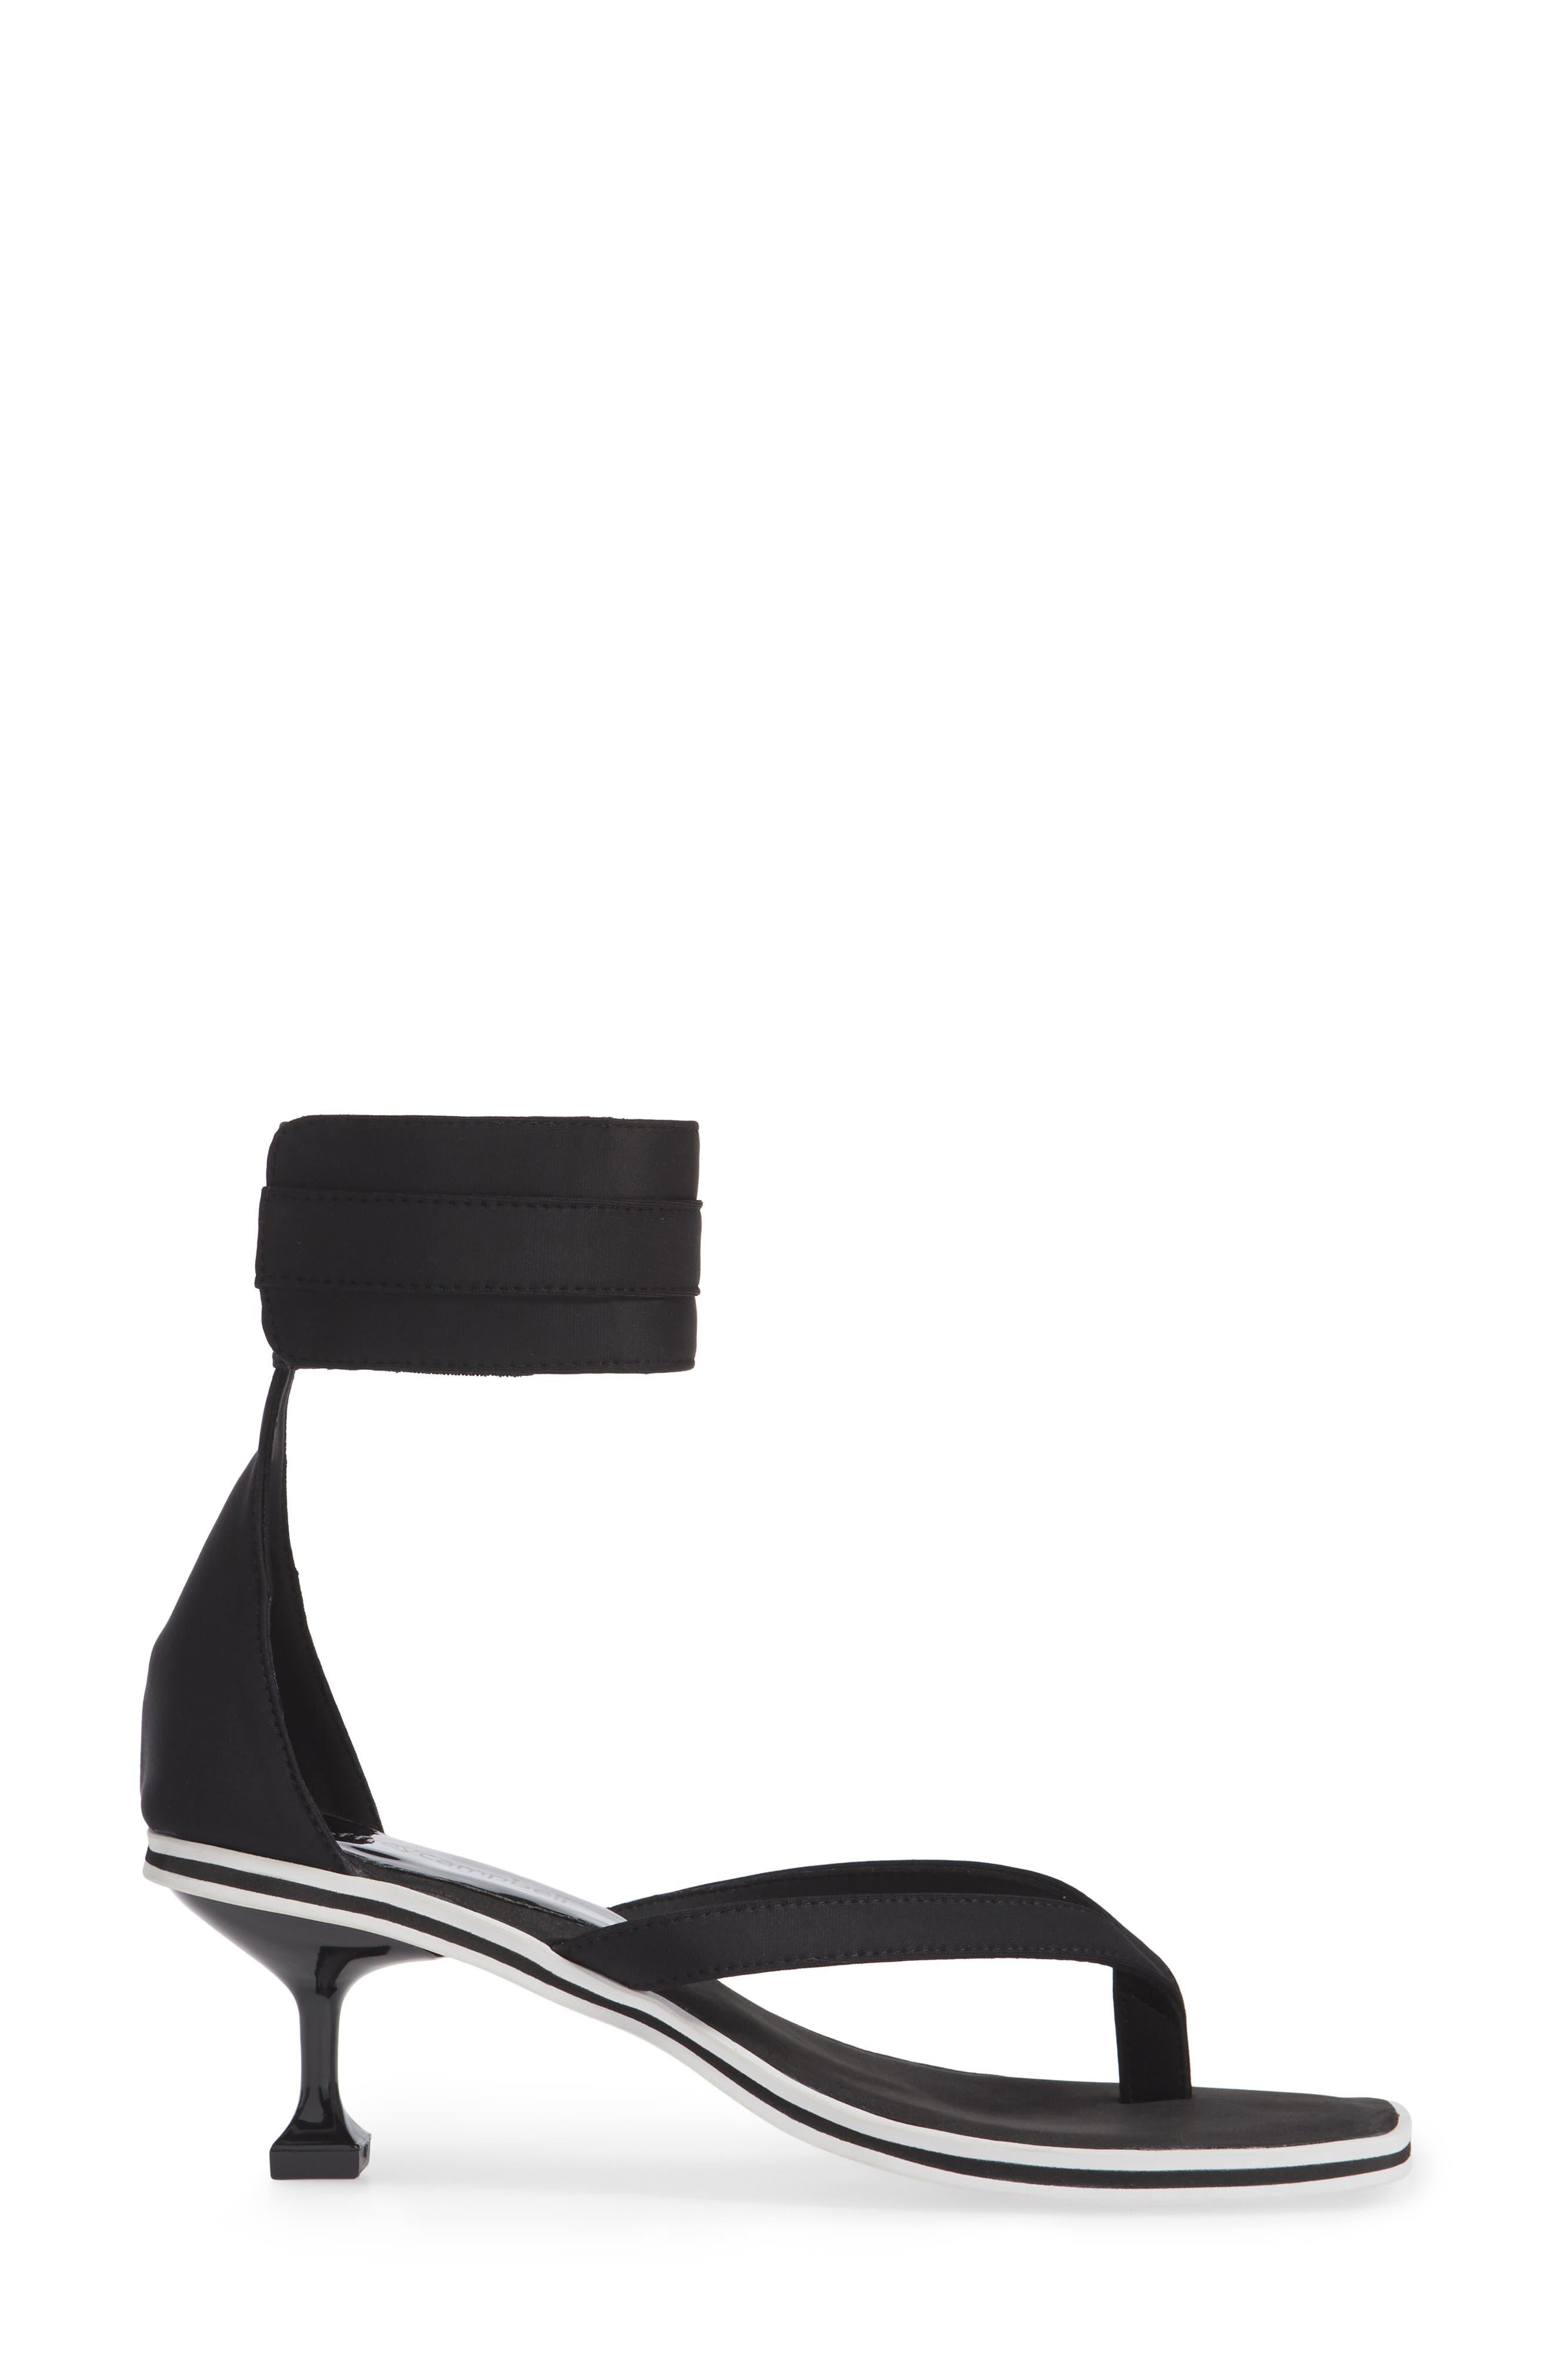 Dribble Cuff Pedestal Sandal,                             Alternate thumbnail 3, color,                             004